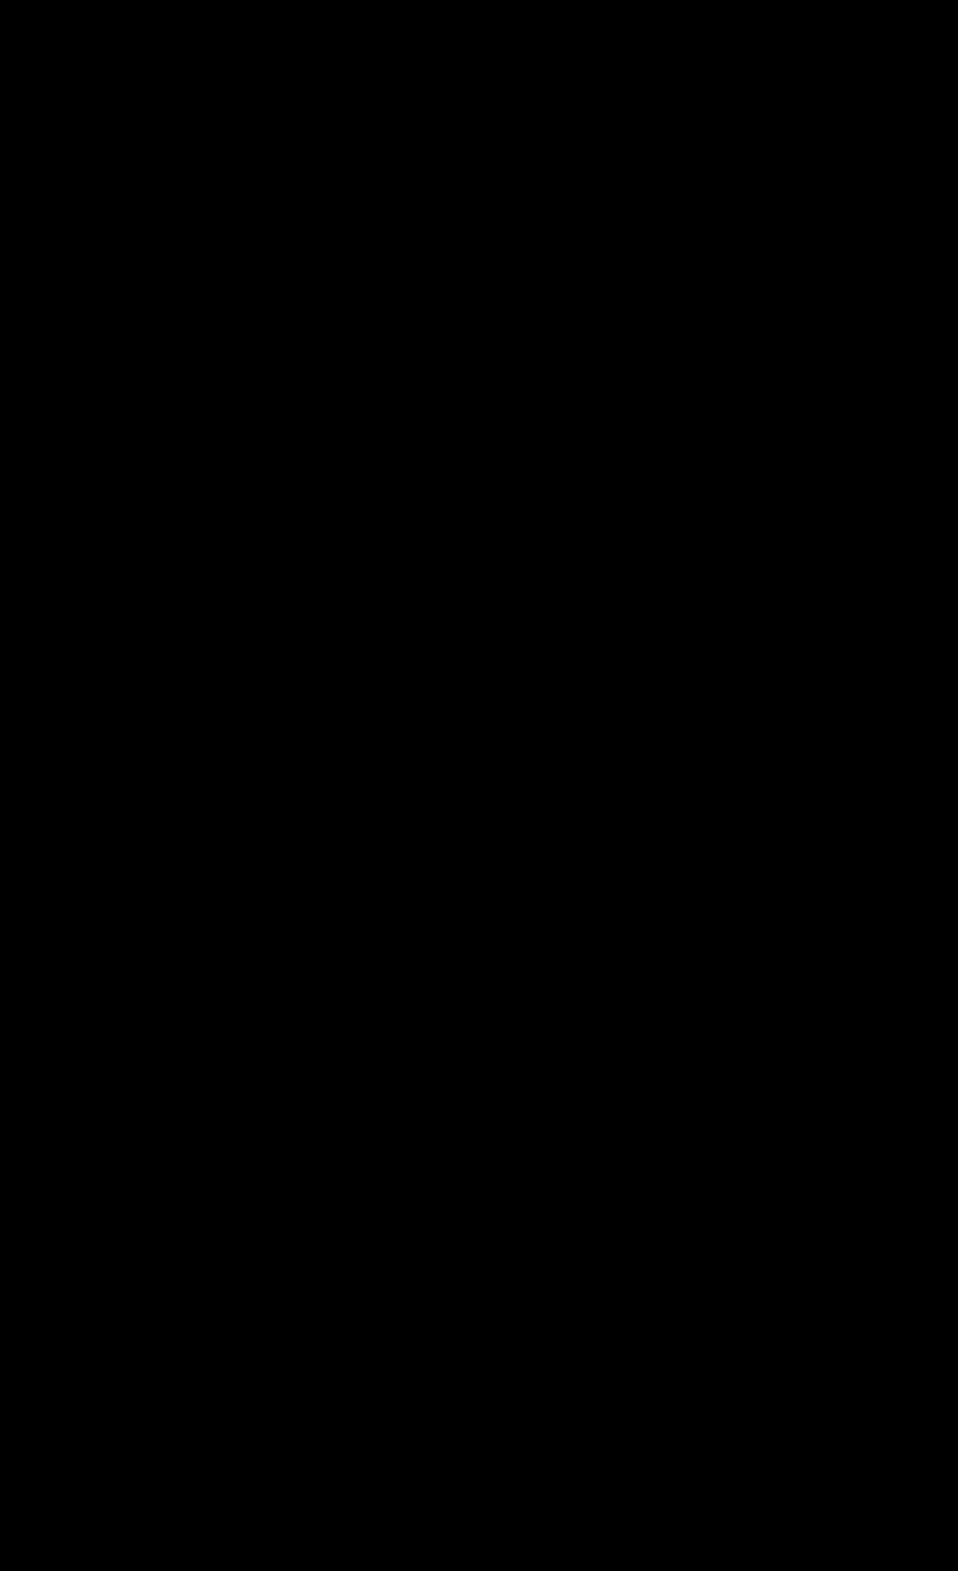 public domain clip art image wolf head silhouette id open source clipart + words open source clipart + words